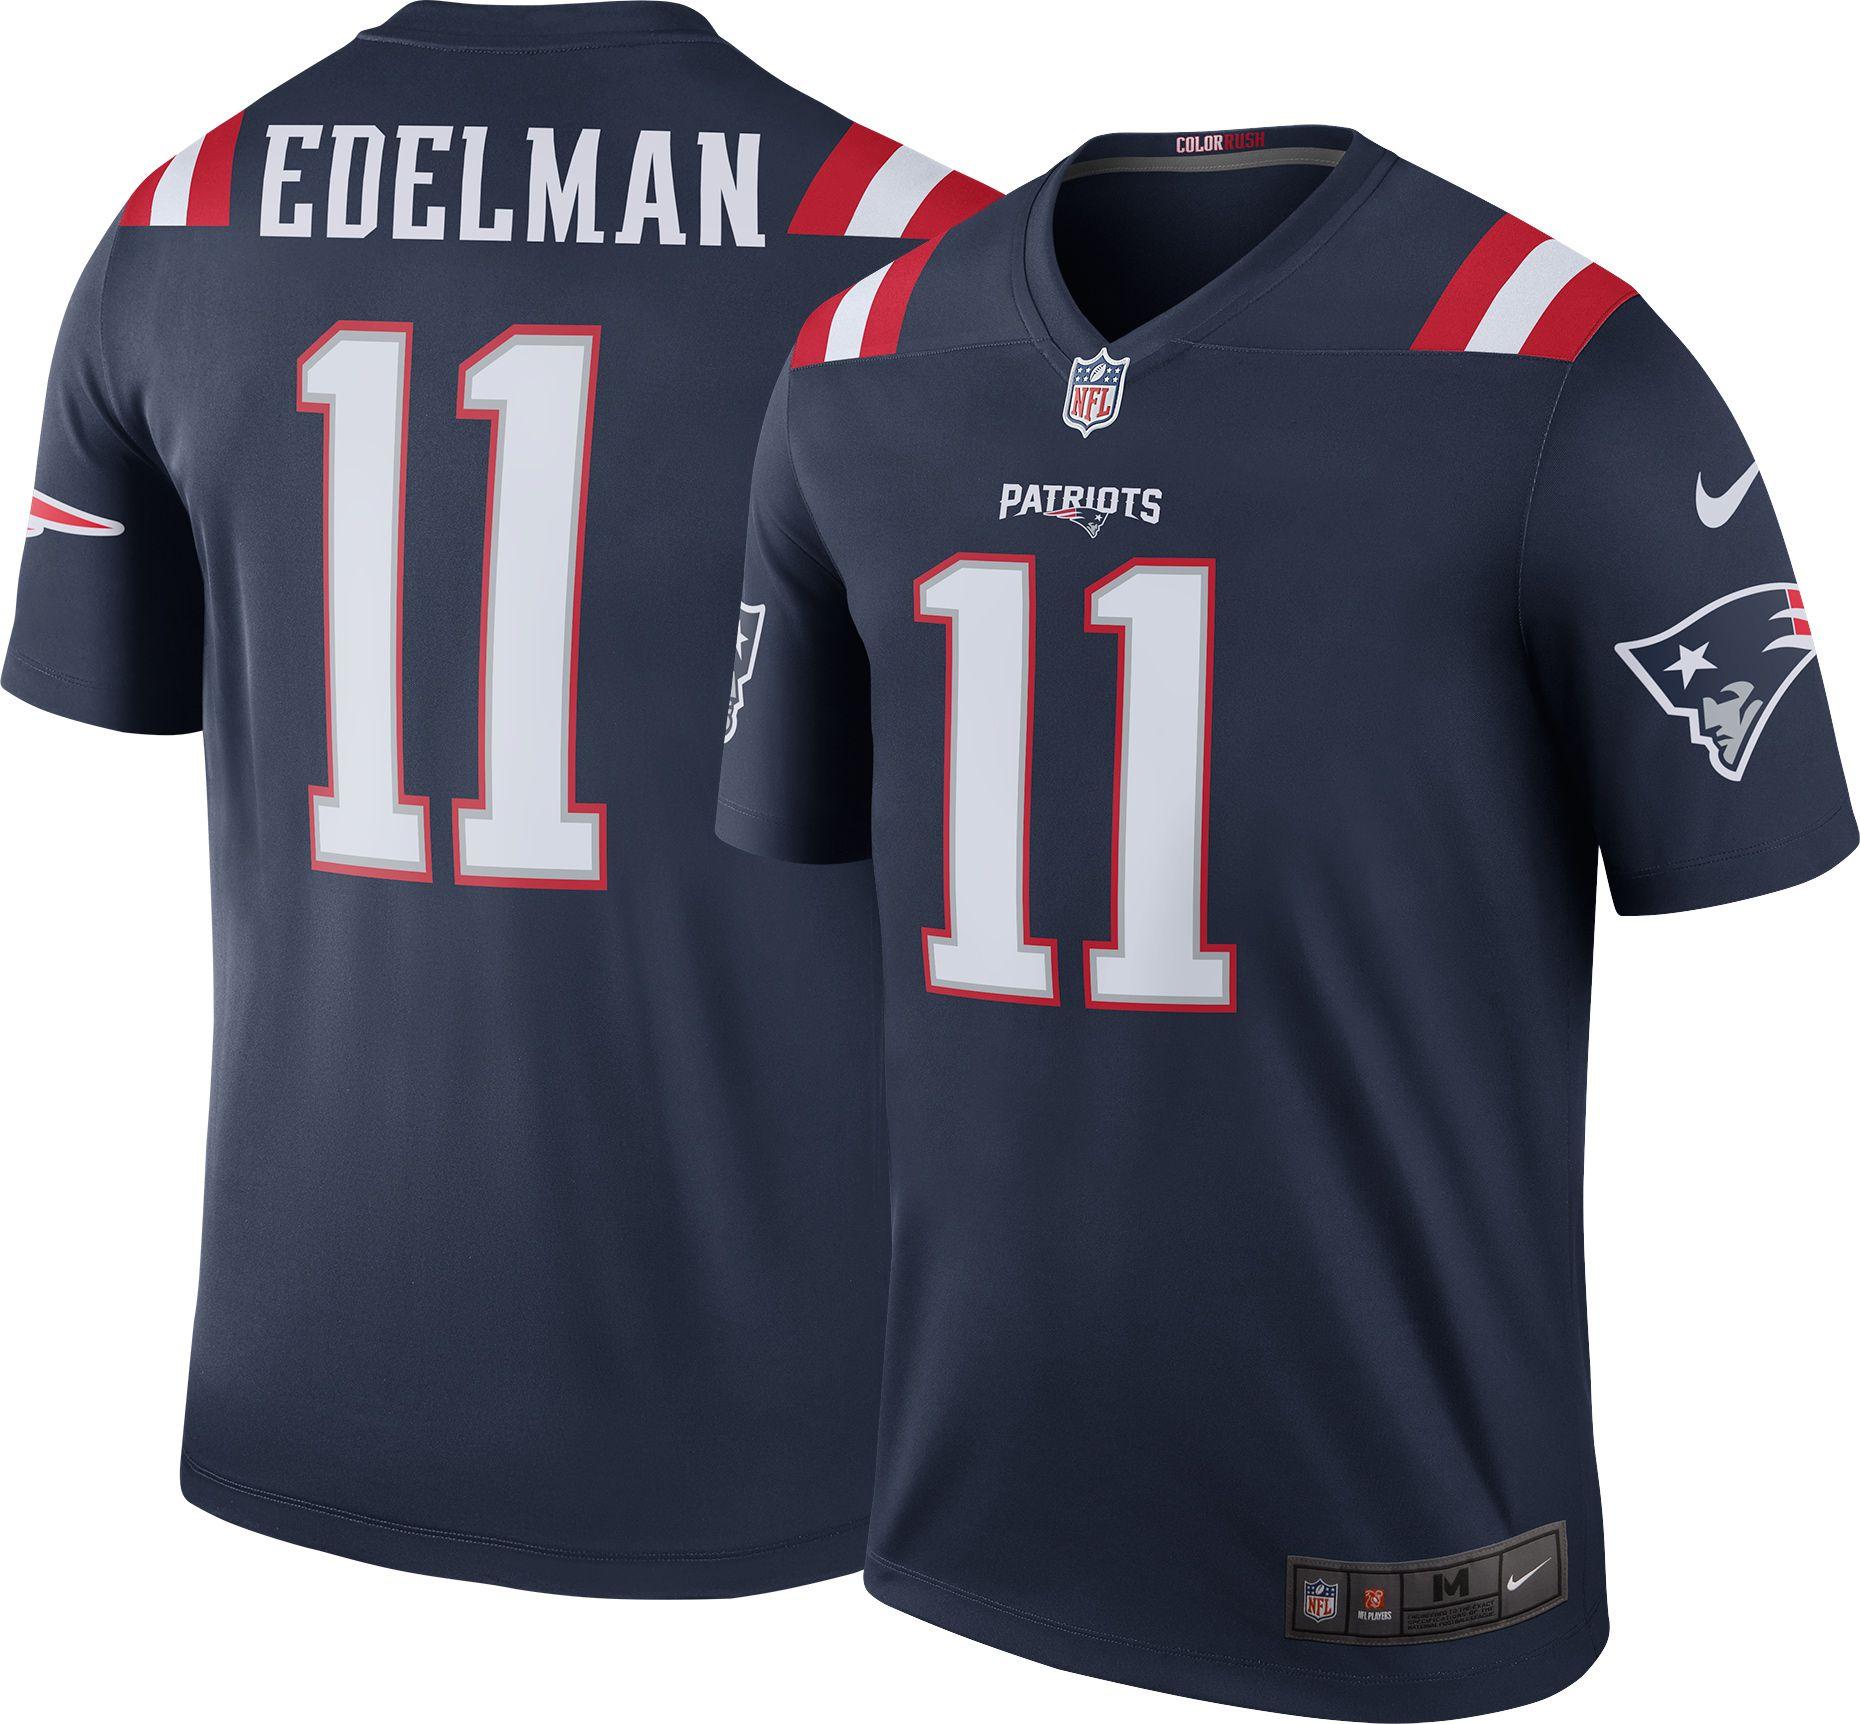 pretty nice 4bca4 24299 julian edelman authentic jersey